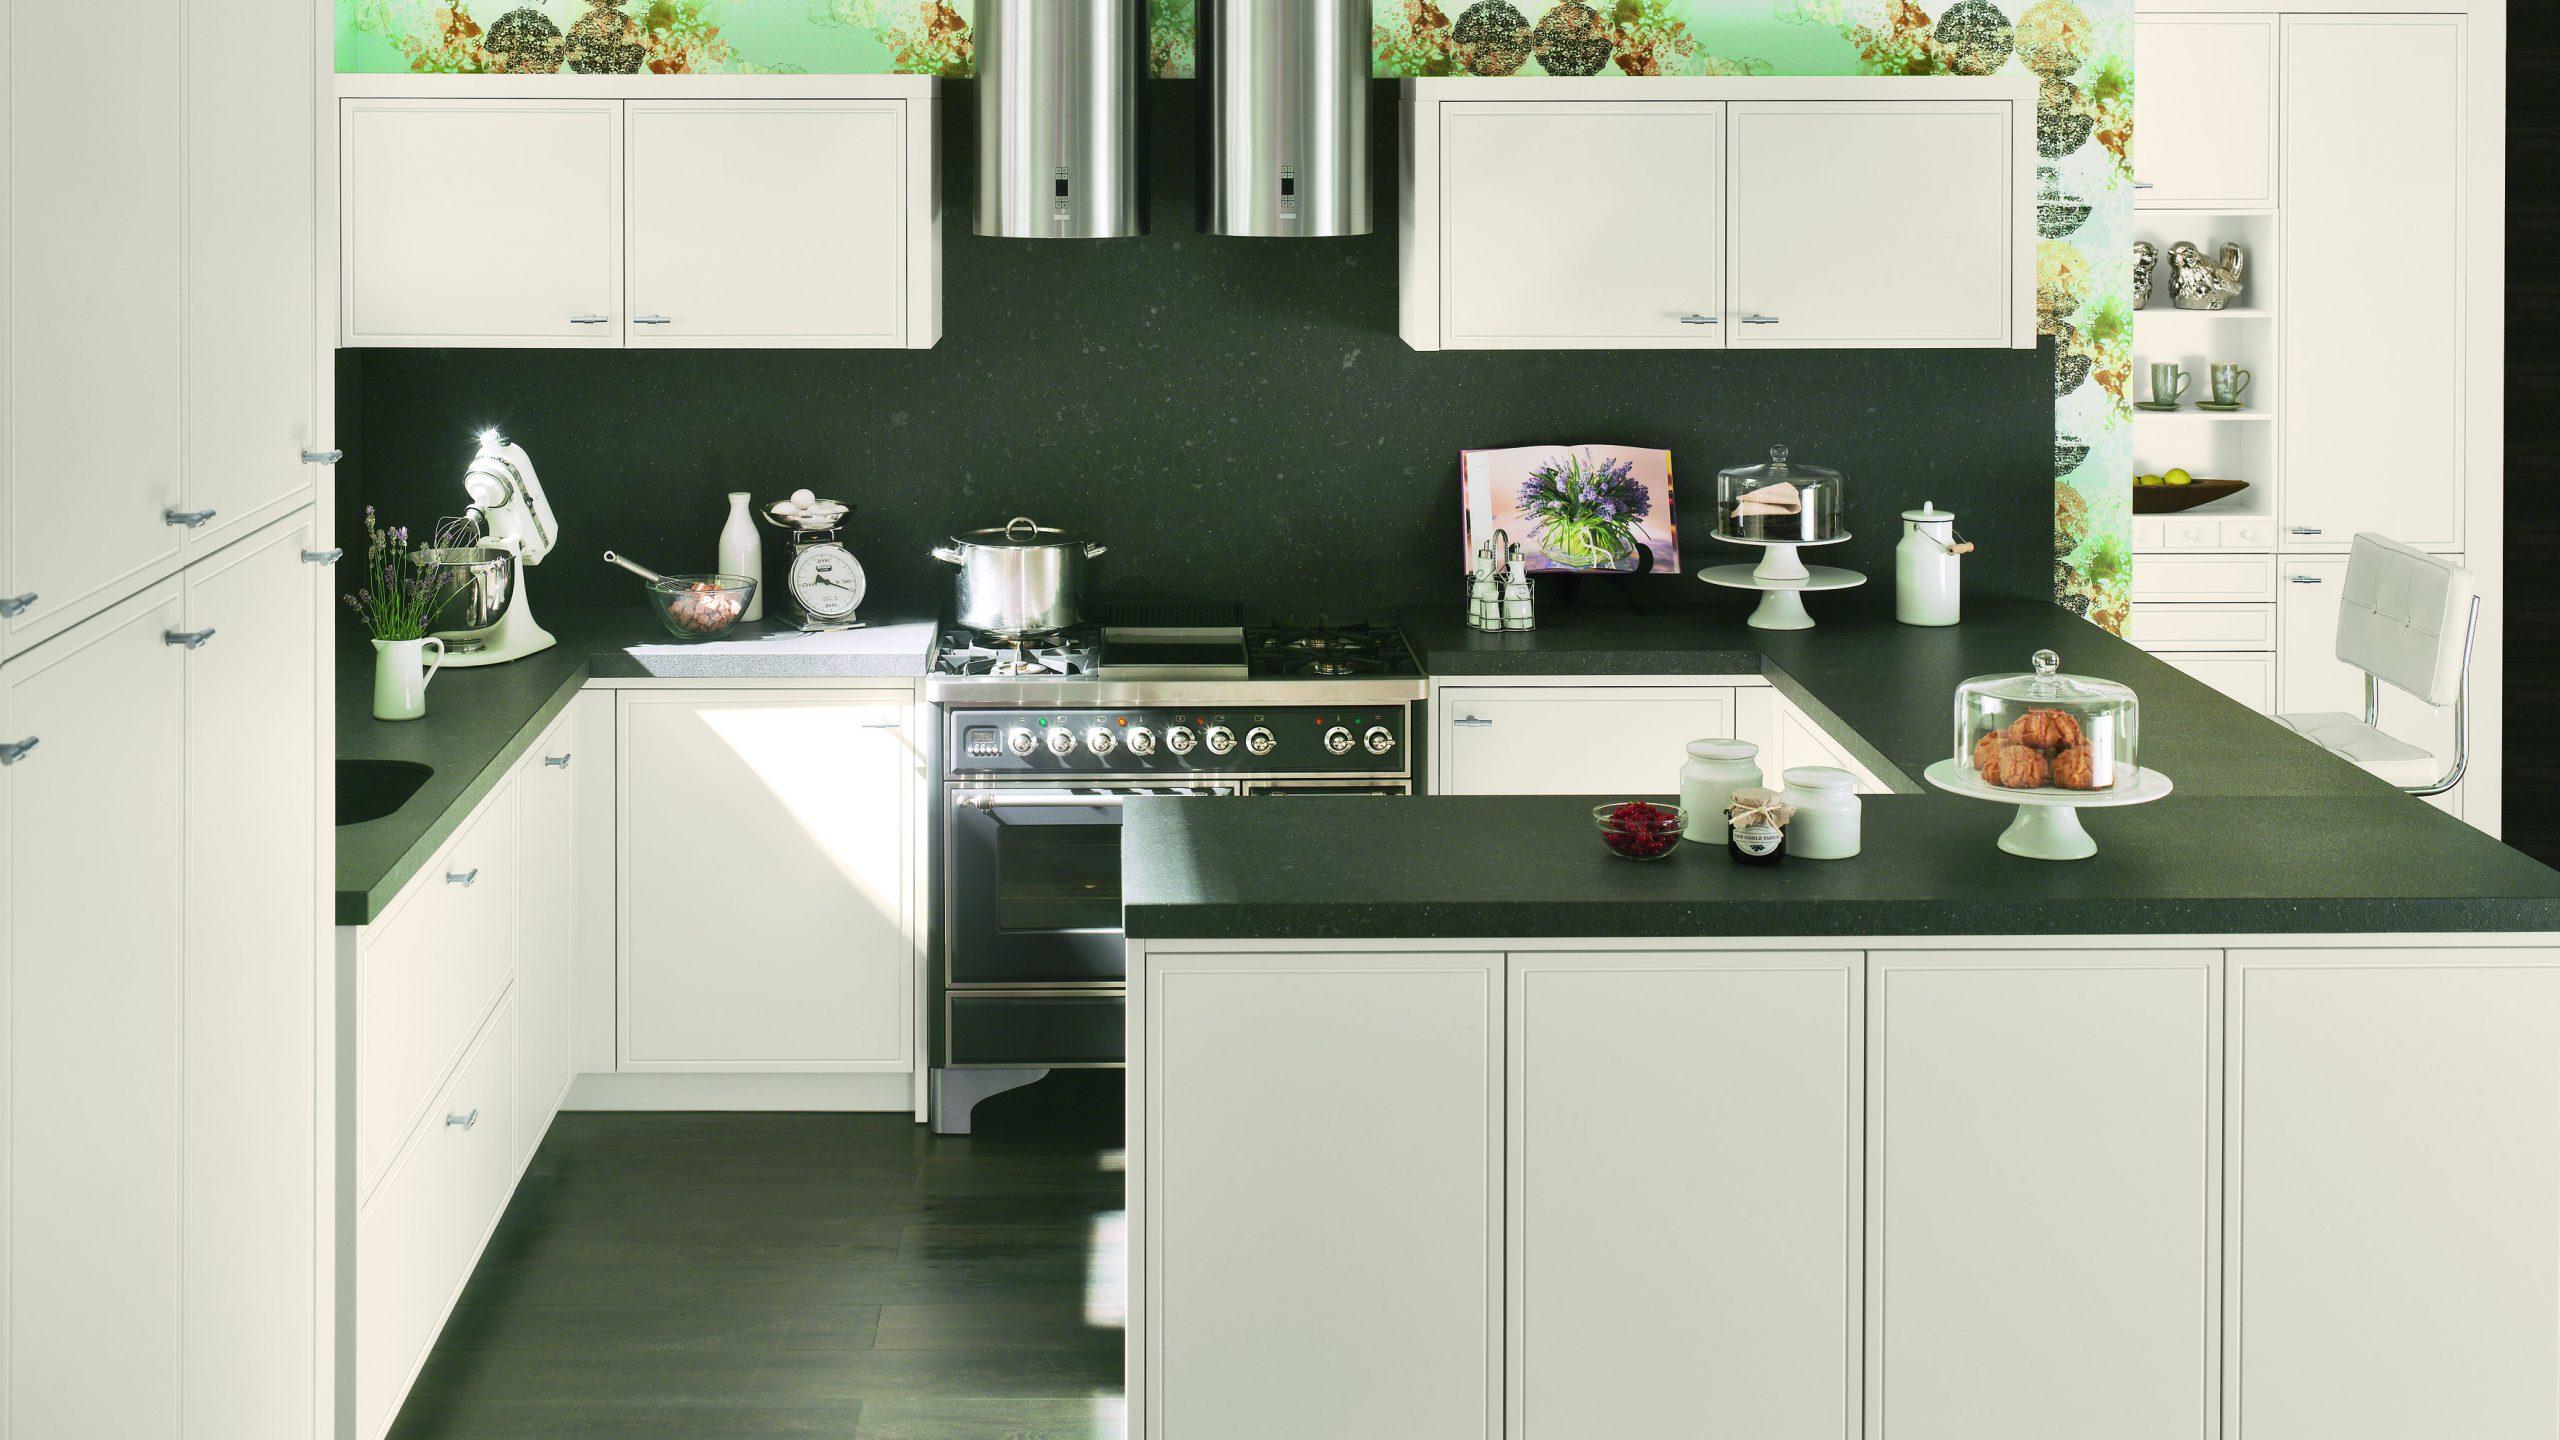 Full Size of Küche Selber Planen Günstig Wie Kann Ich Meine Küche Selber Planen Gastronomie Küche Selber Planen Küche Selber Planen Ikea Küche Küche Selber Planen